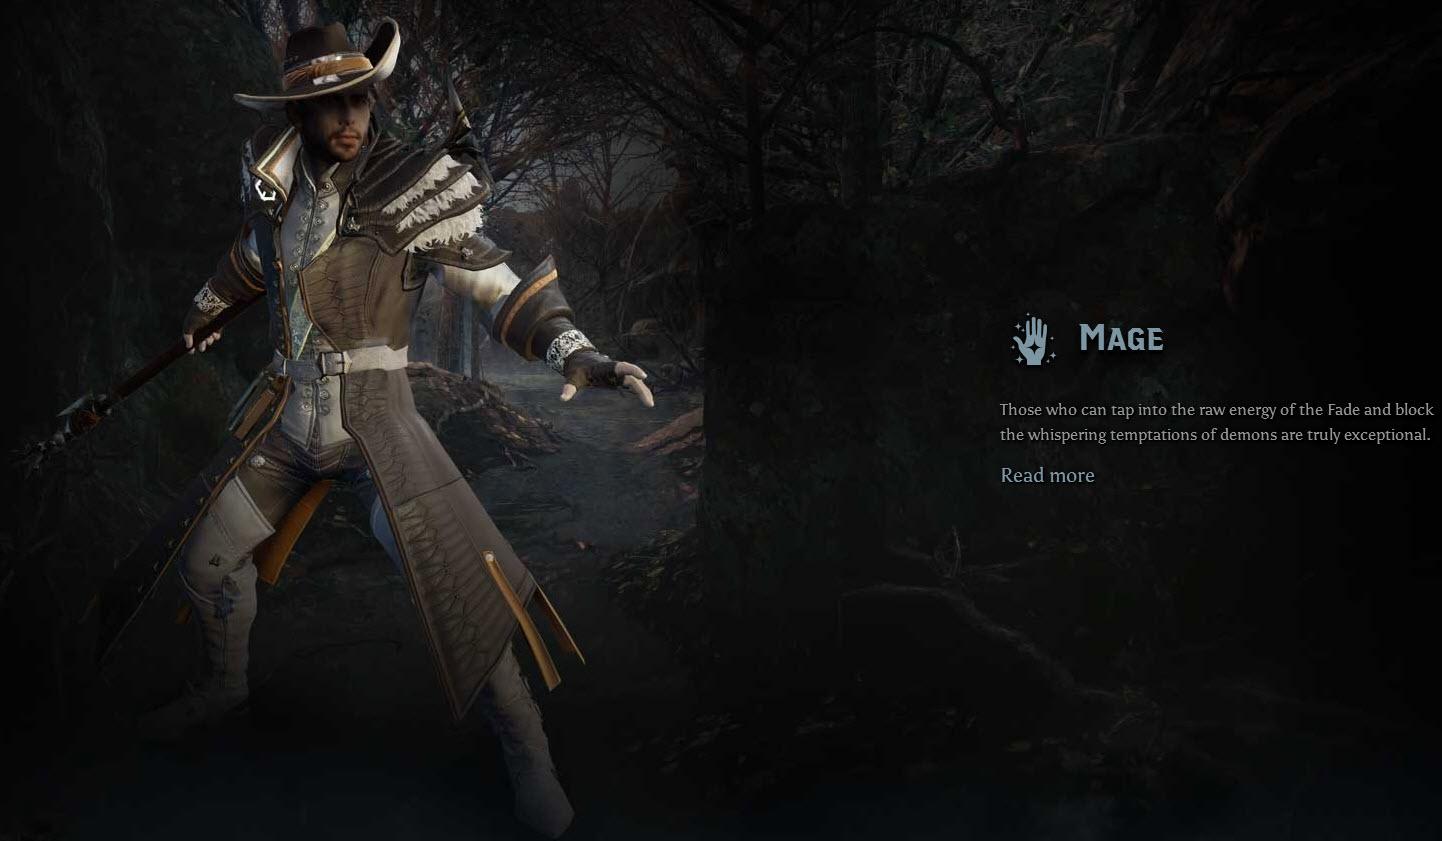 dragon-age-inquisition-mage